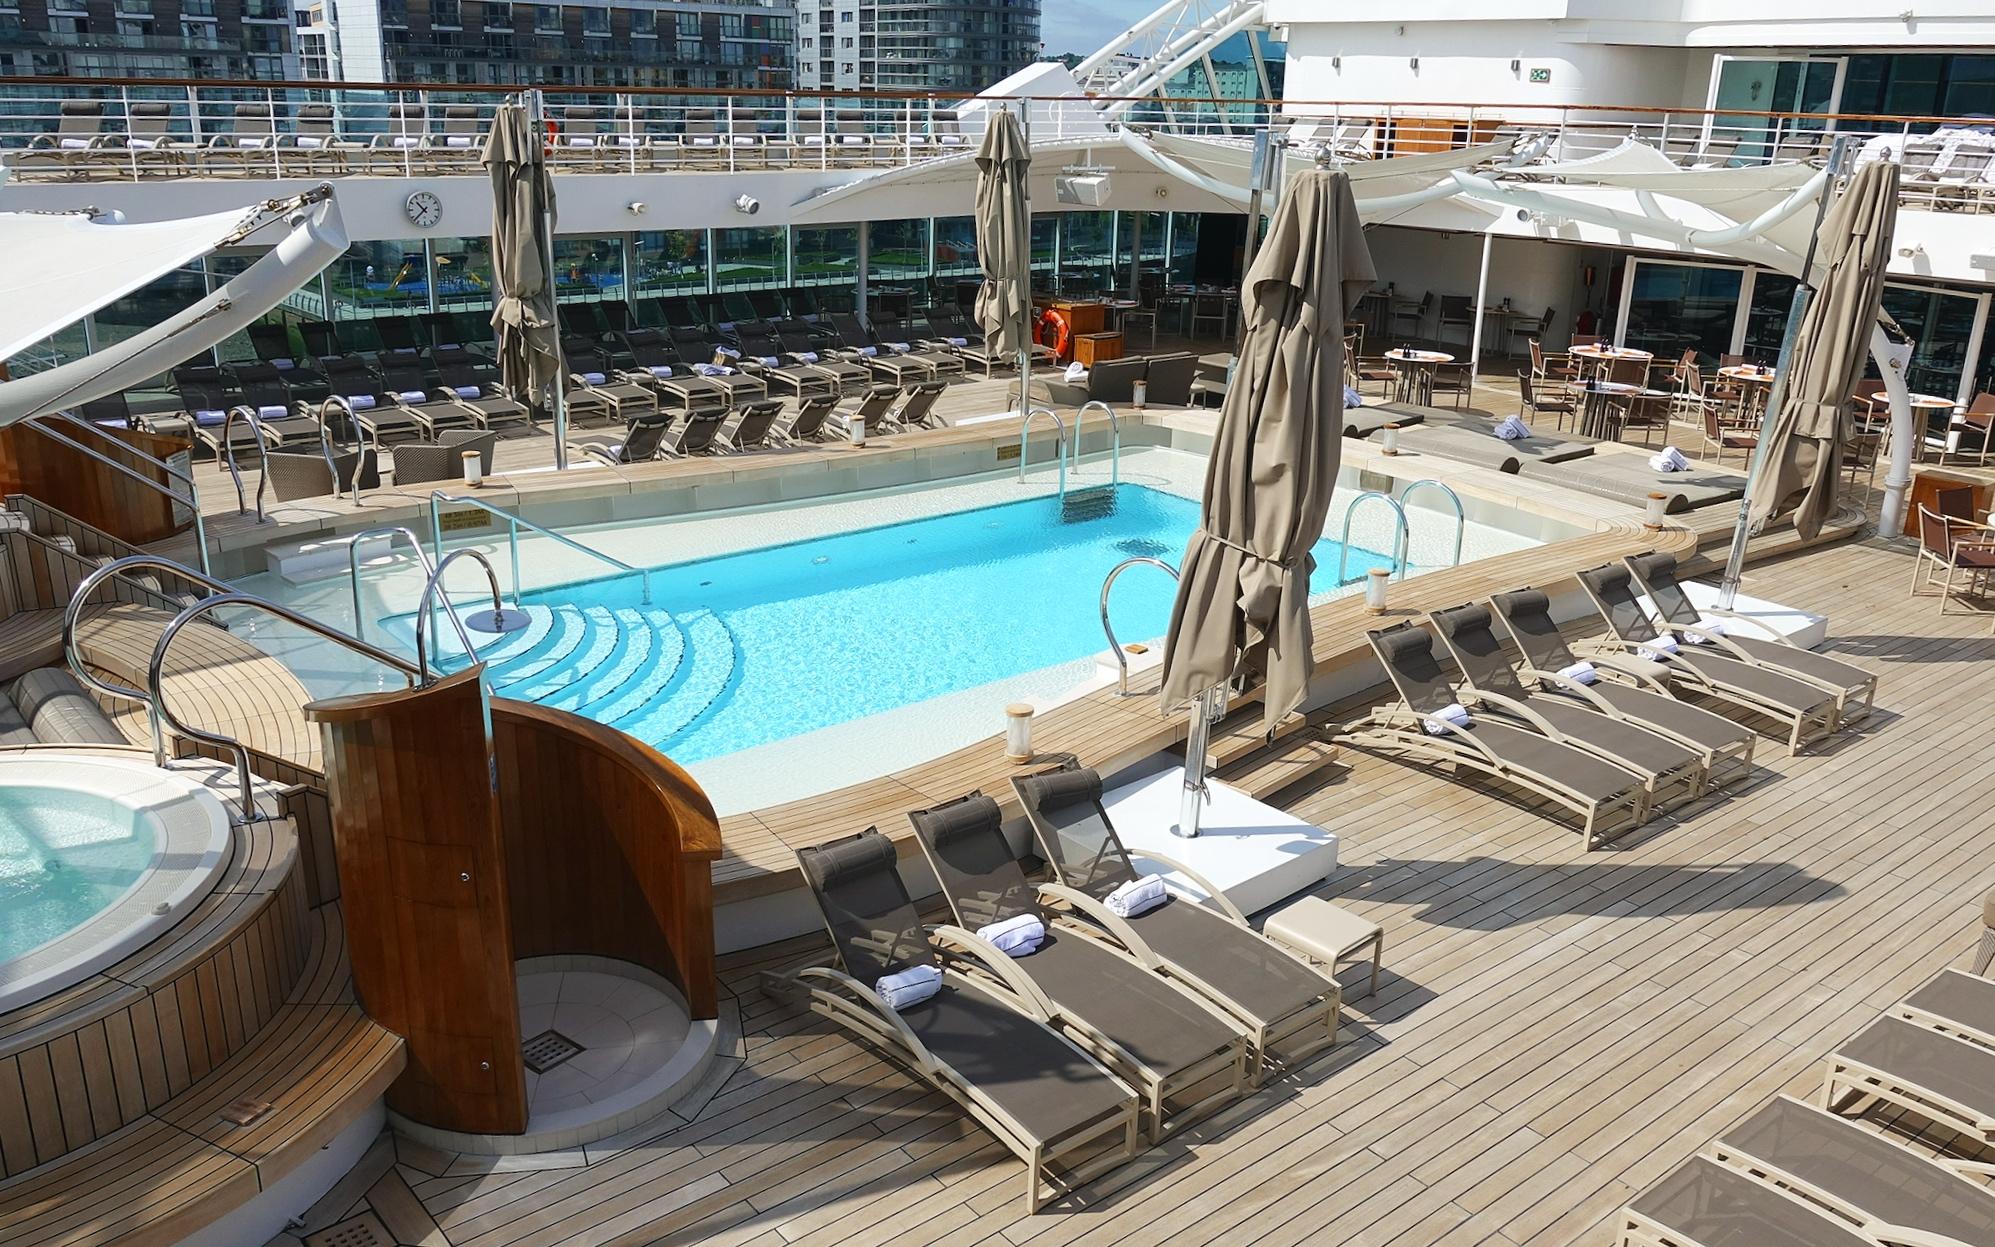 The beautiful pool deck.